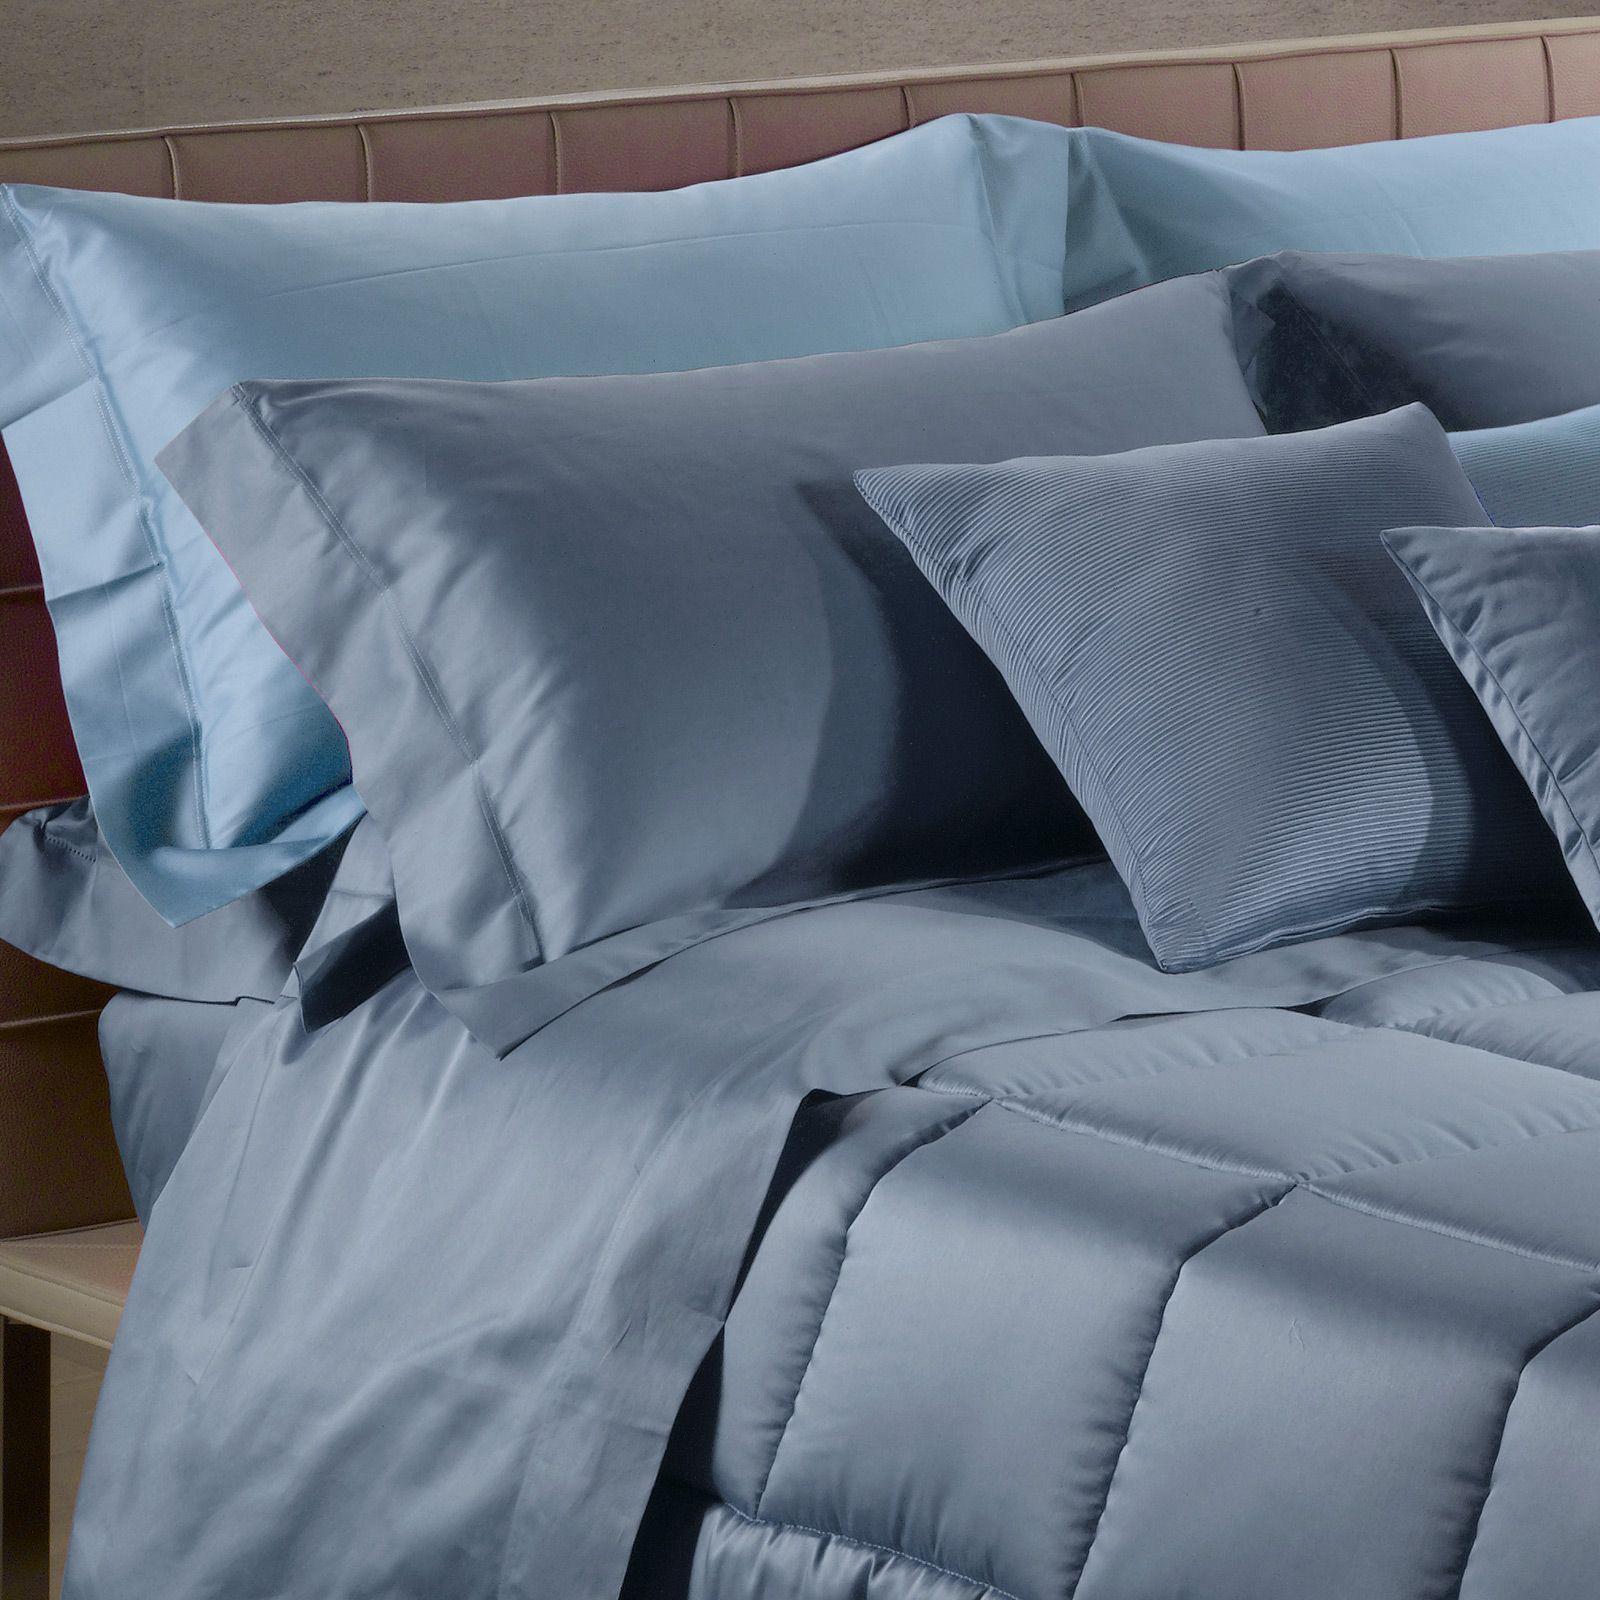 Для сна Наволочки 2шт 50x70 Caleffi Raso Tinta Unito синие komplekt-navolochek-50x70-caleffi-raso-tinta-unito-siniy-italiya.jpg